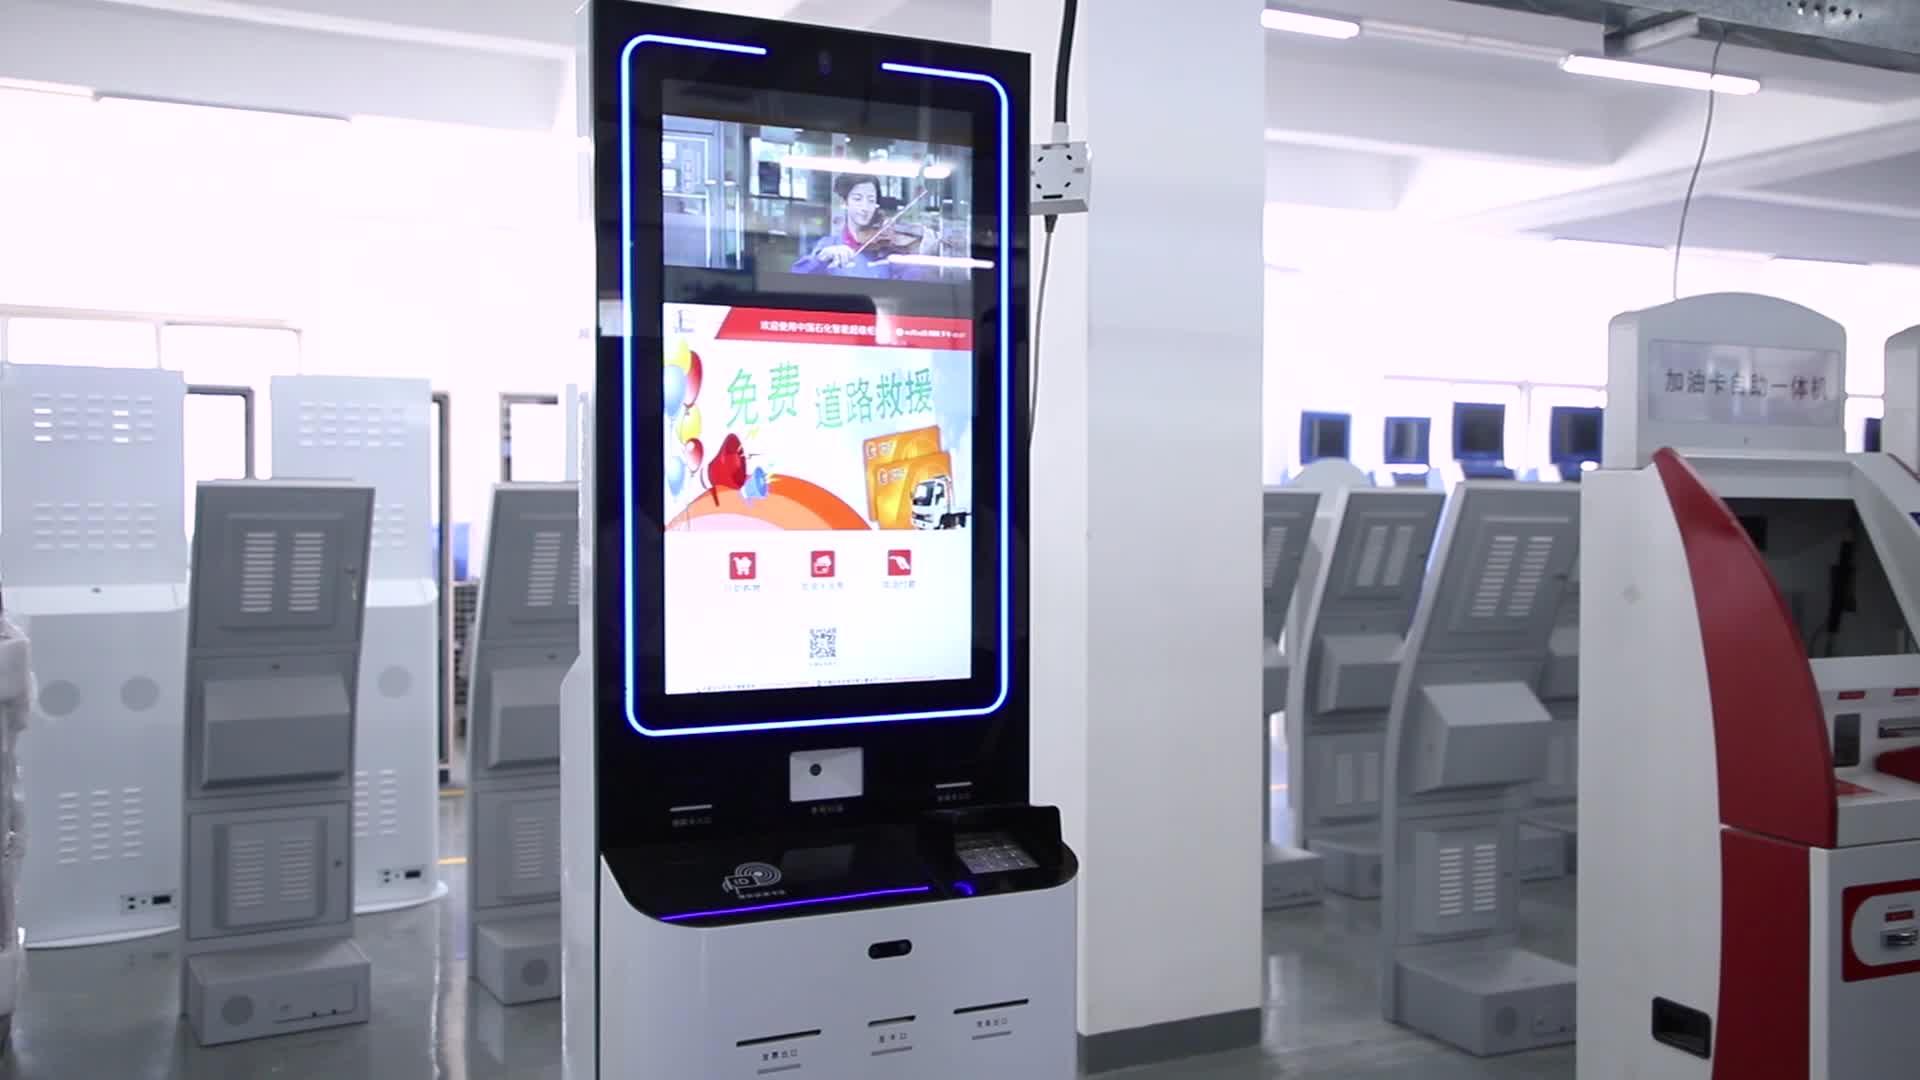 मिनी घटनाओं स्वत कतार प्रणाली सॉफ्टवेयर टिकट वेंडिंग मशीन मुद्रण मशीन ट्रेन नकद डिजिटल